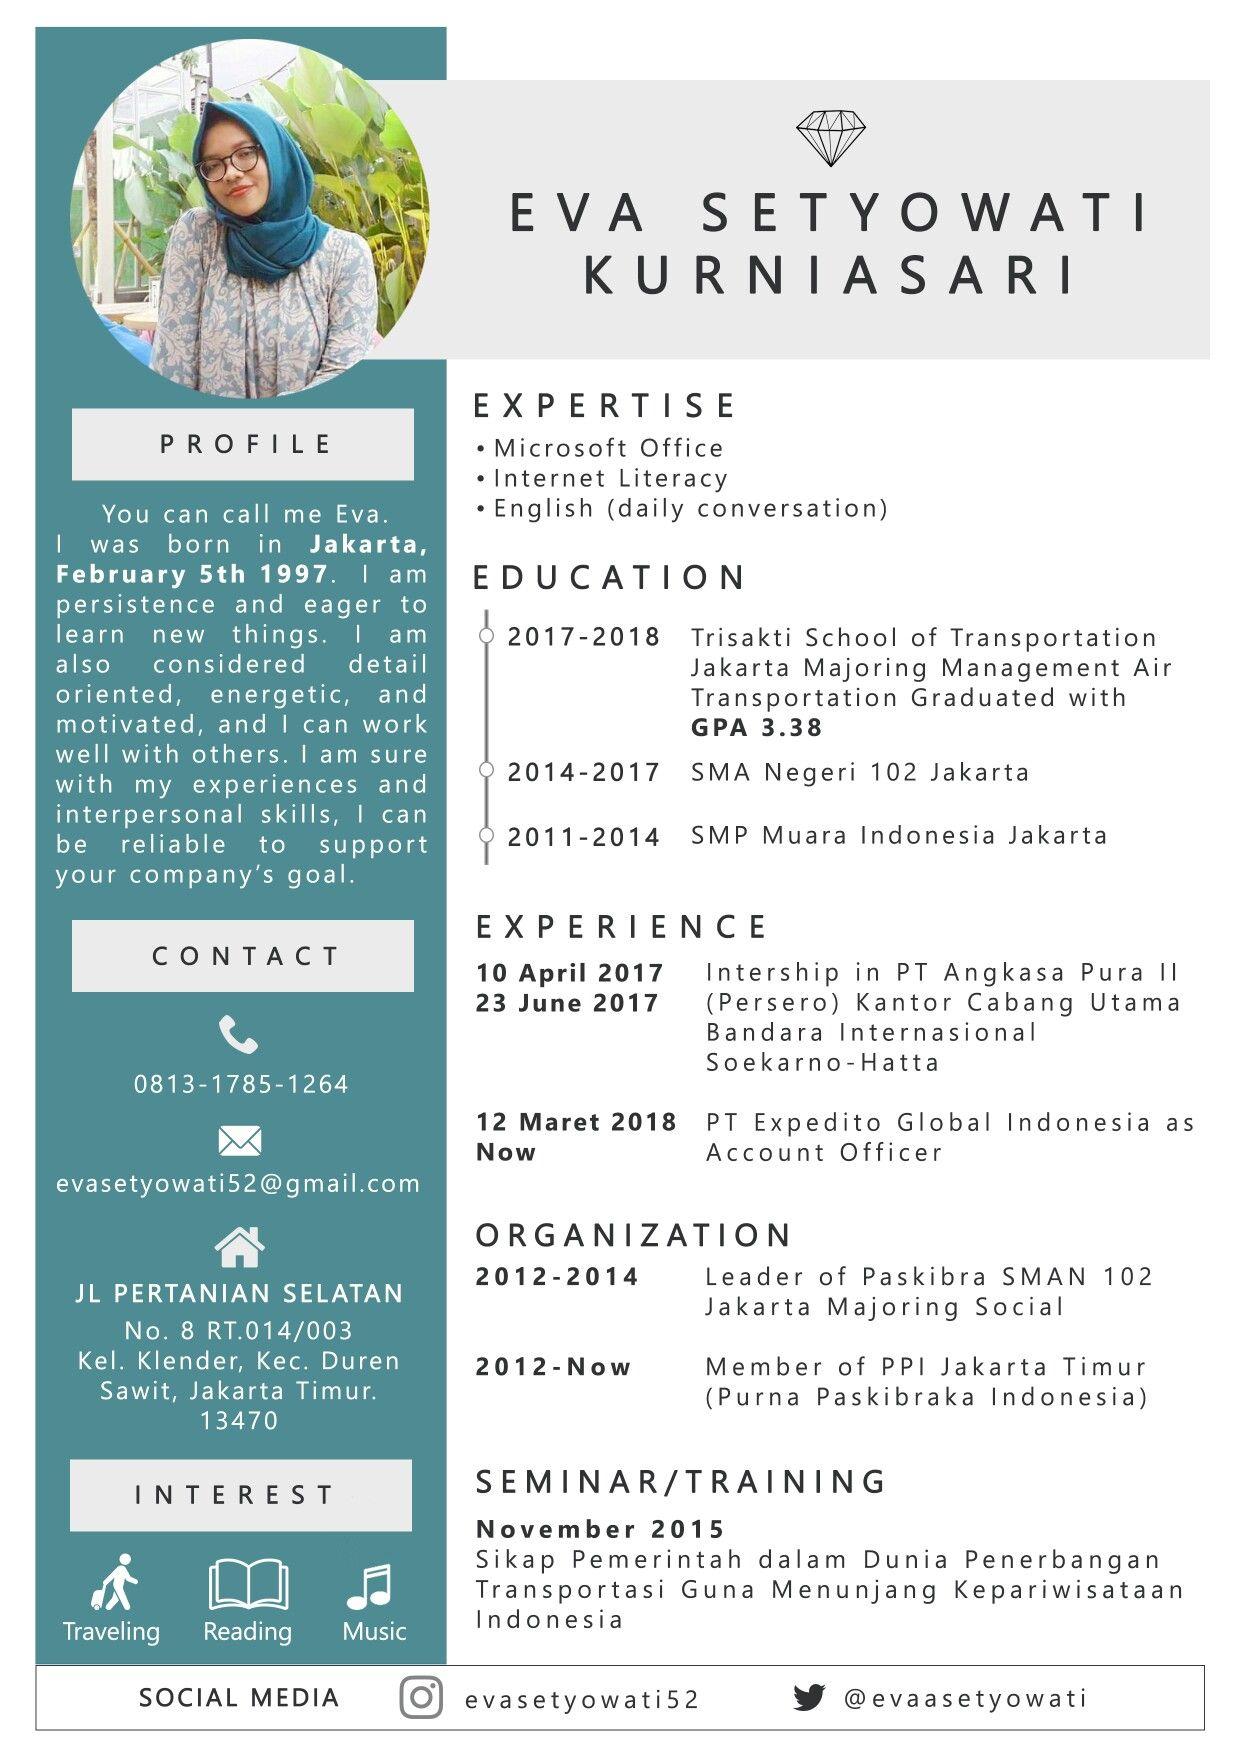 Eva Setyowati Kurniasari Curriculumvitae Daftarriwayathidup Cv Photoshop